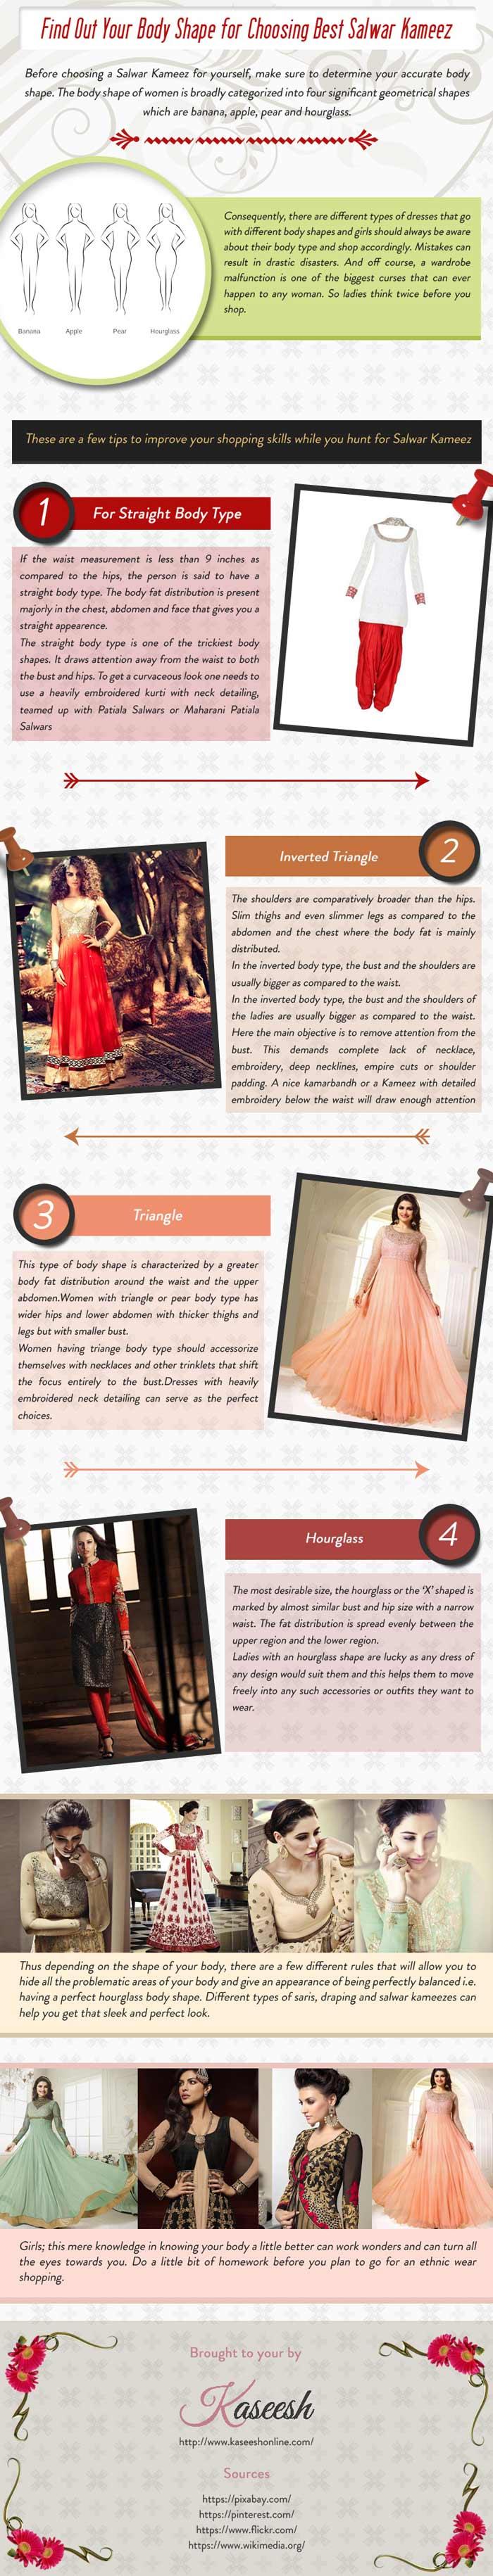 Find-out-your-body-shape-for-choosing-best-salwar-kameez